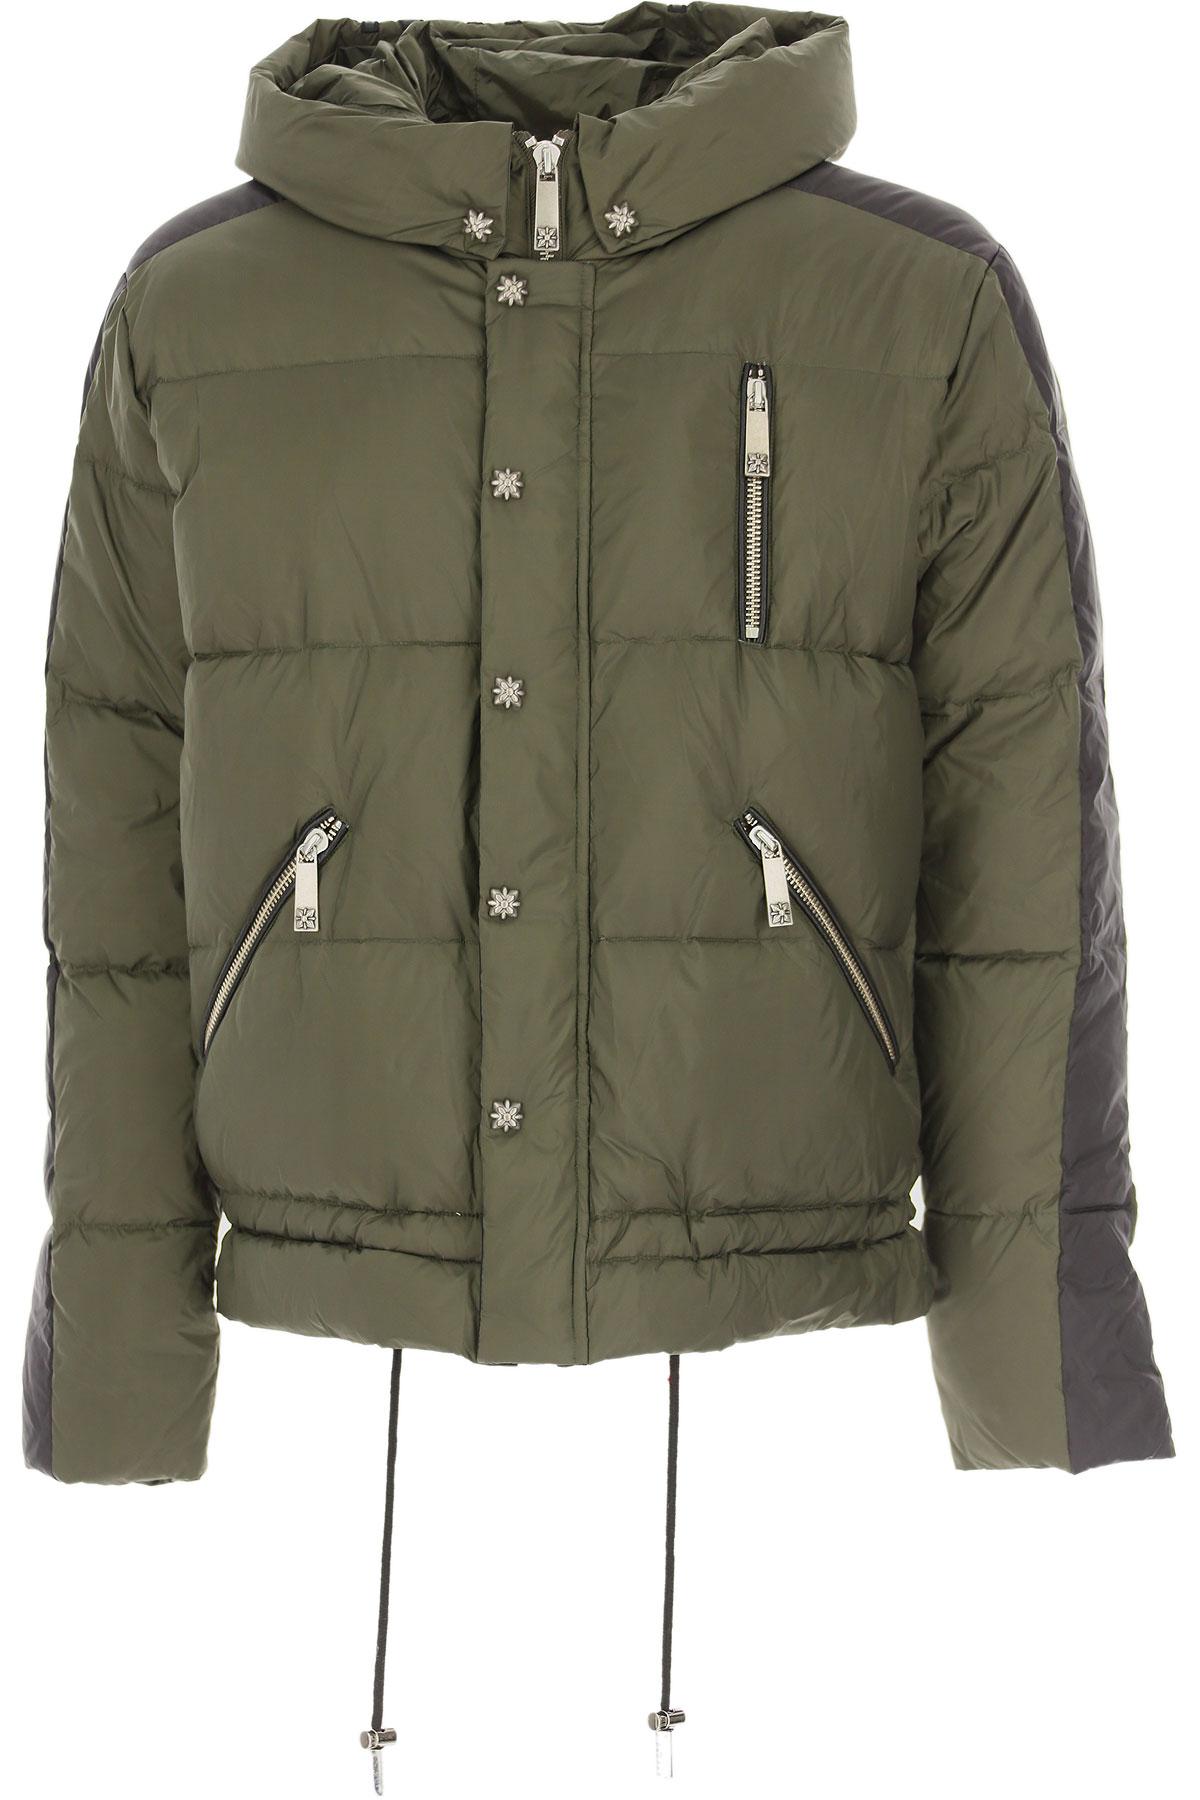 John Richmond Down Jacket for Men, Puffer Ski Jacket On Sale, Military Green, Down, 2019, L M S XL